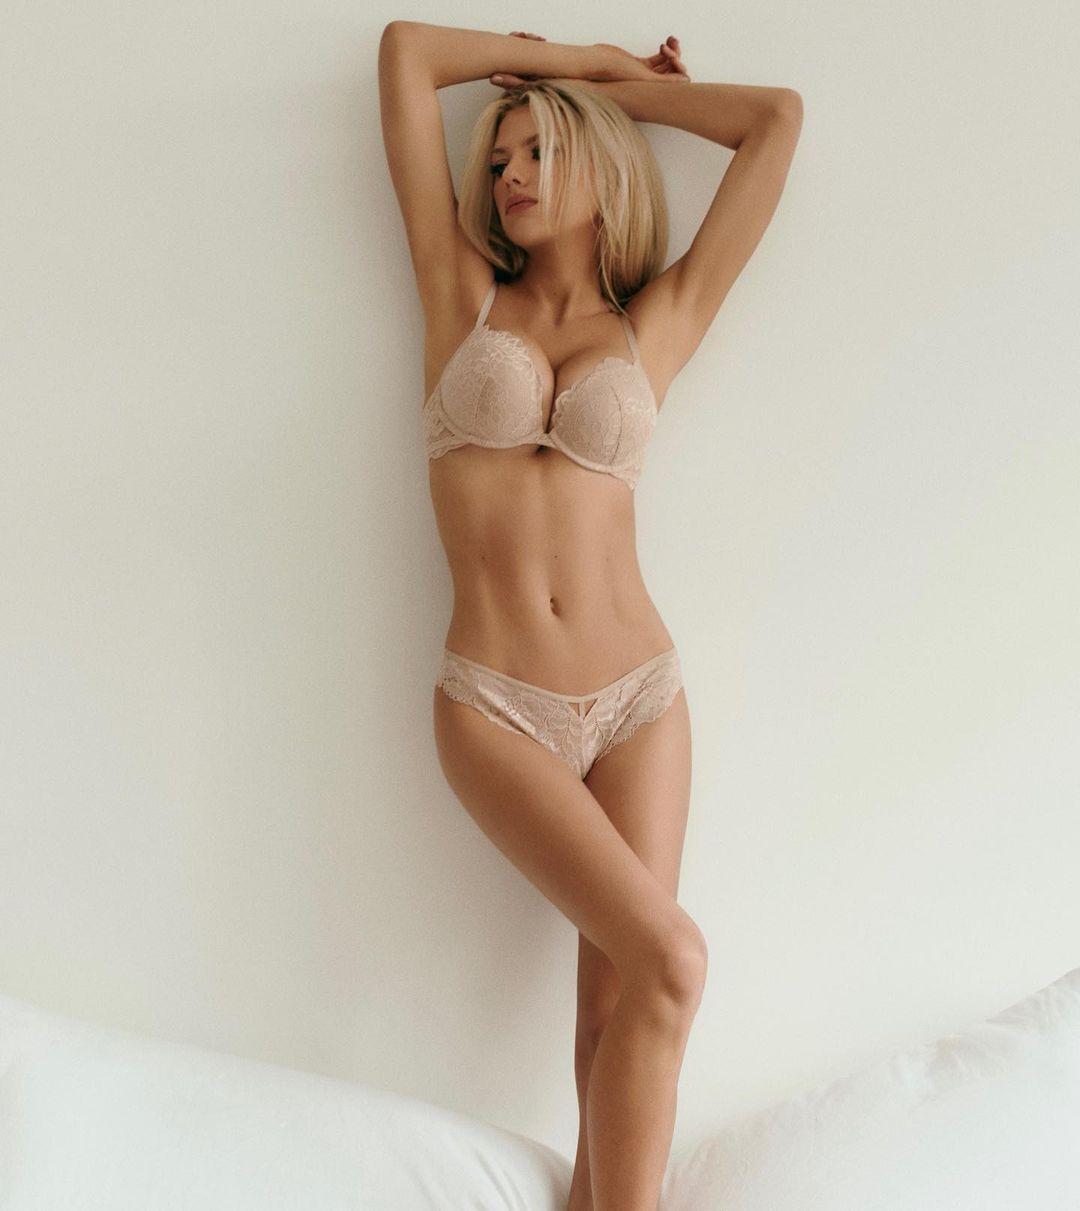 Charlotte Mckinney Sexy In Bra And Panties